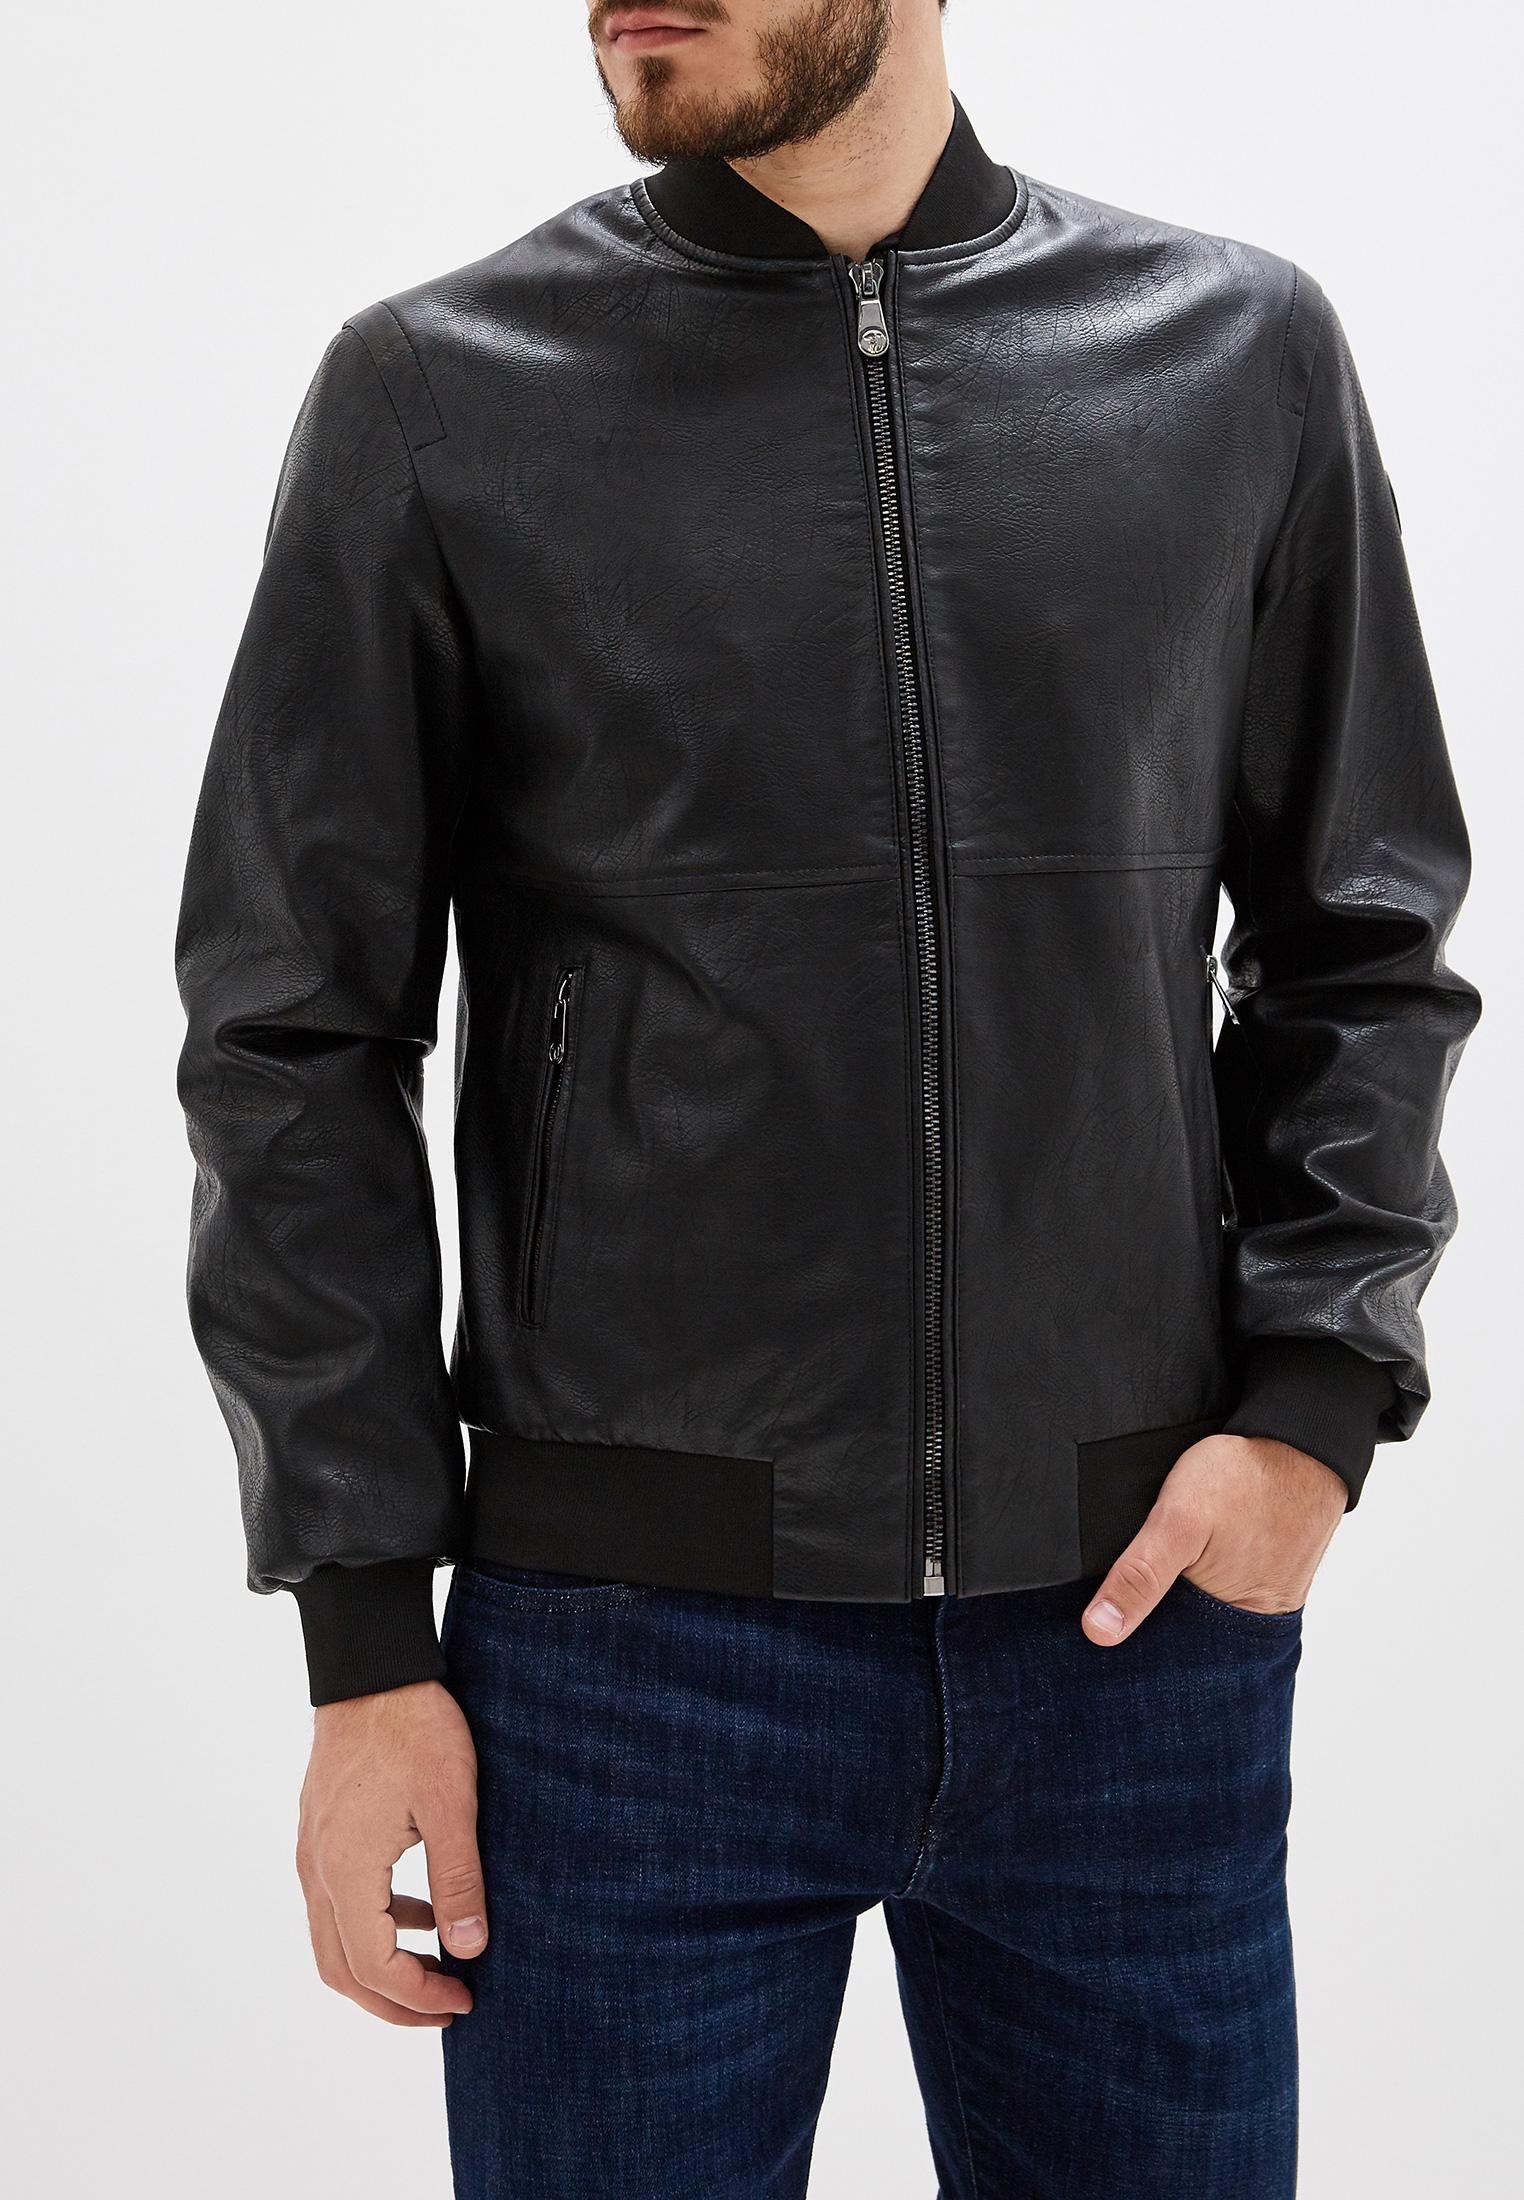 Кожаная куртка TRUSSARDI JEANS (Труссарди Джинс) 52s00353